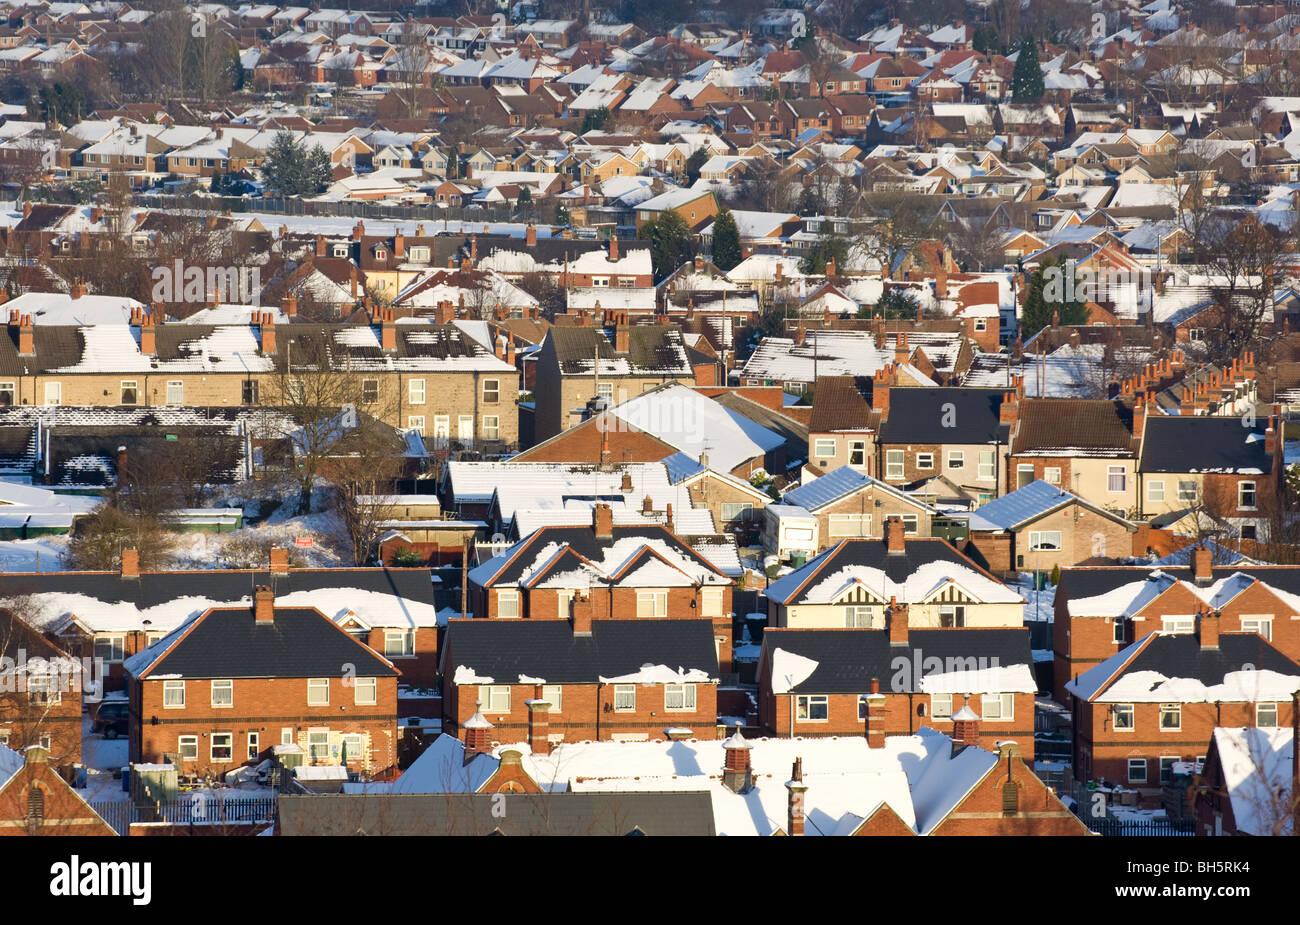 housing-with-poor-loft-insulation-heat-l